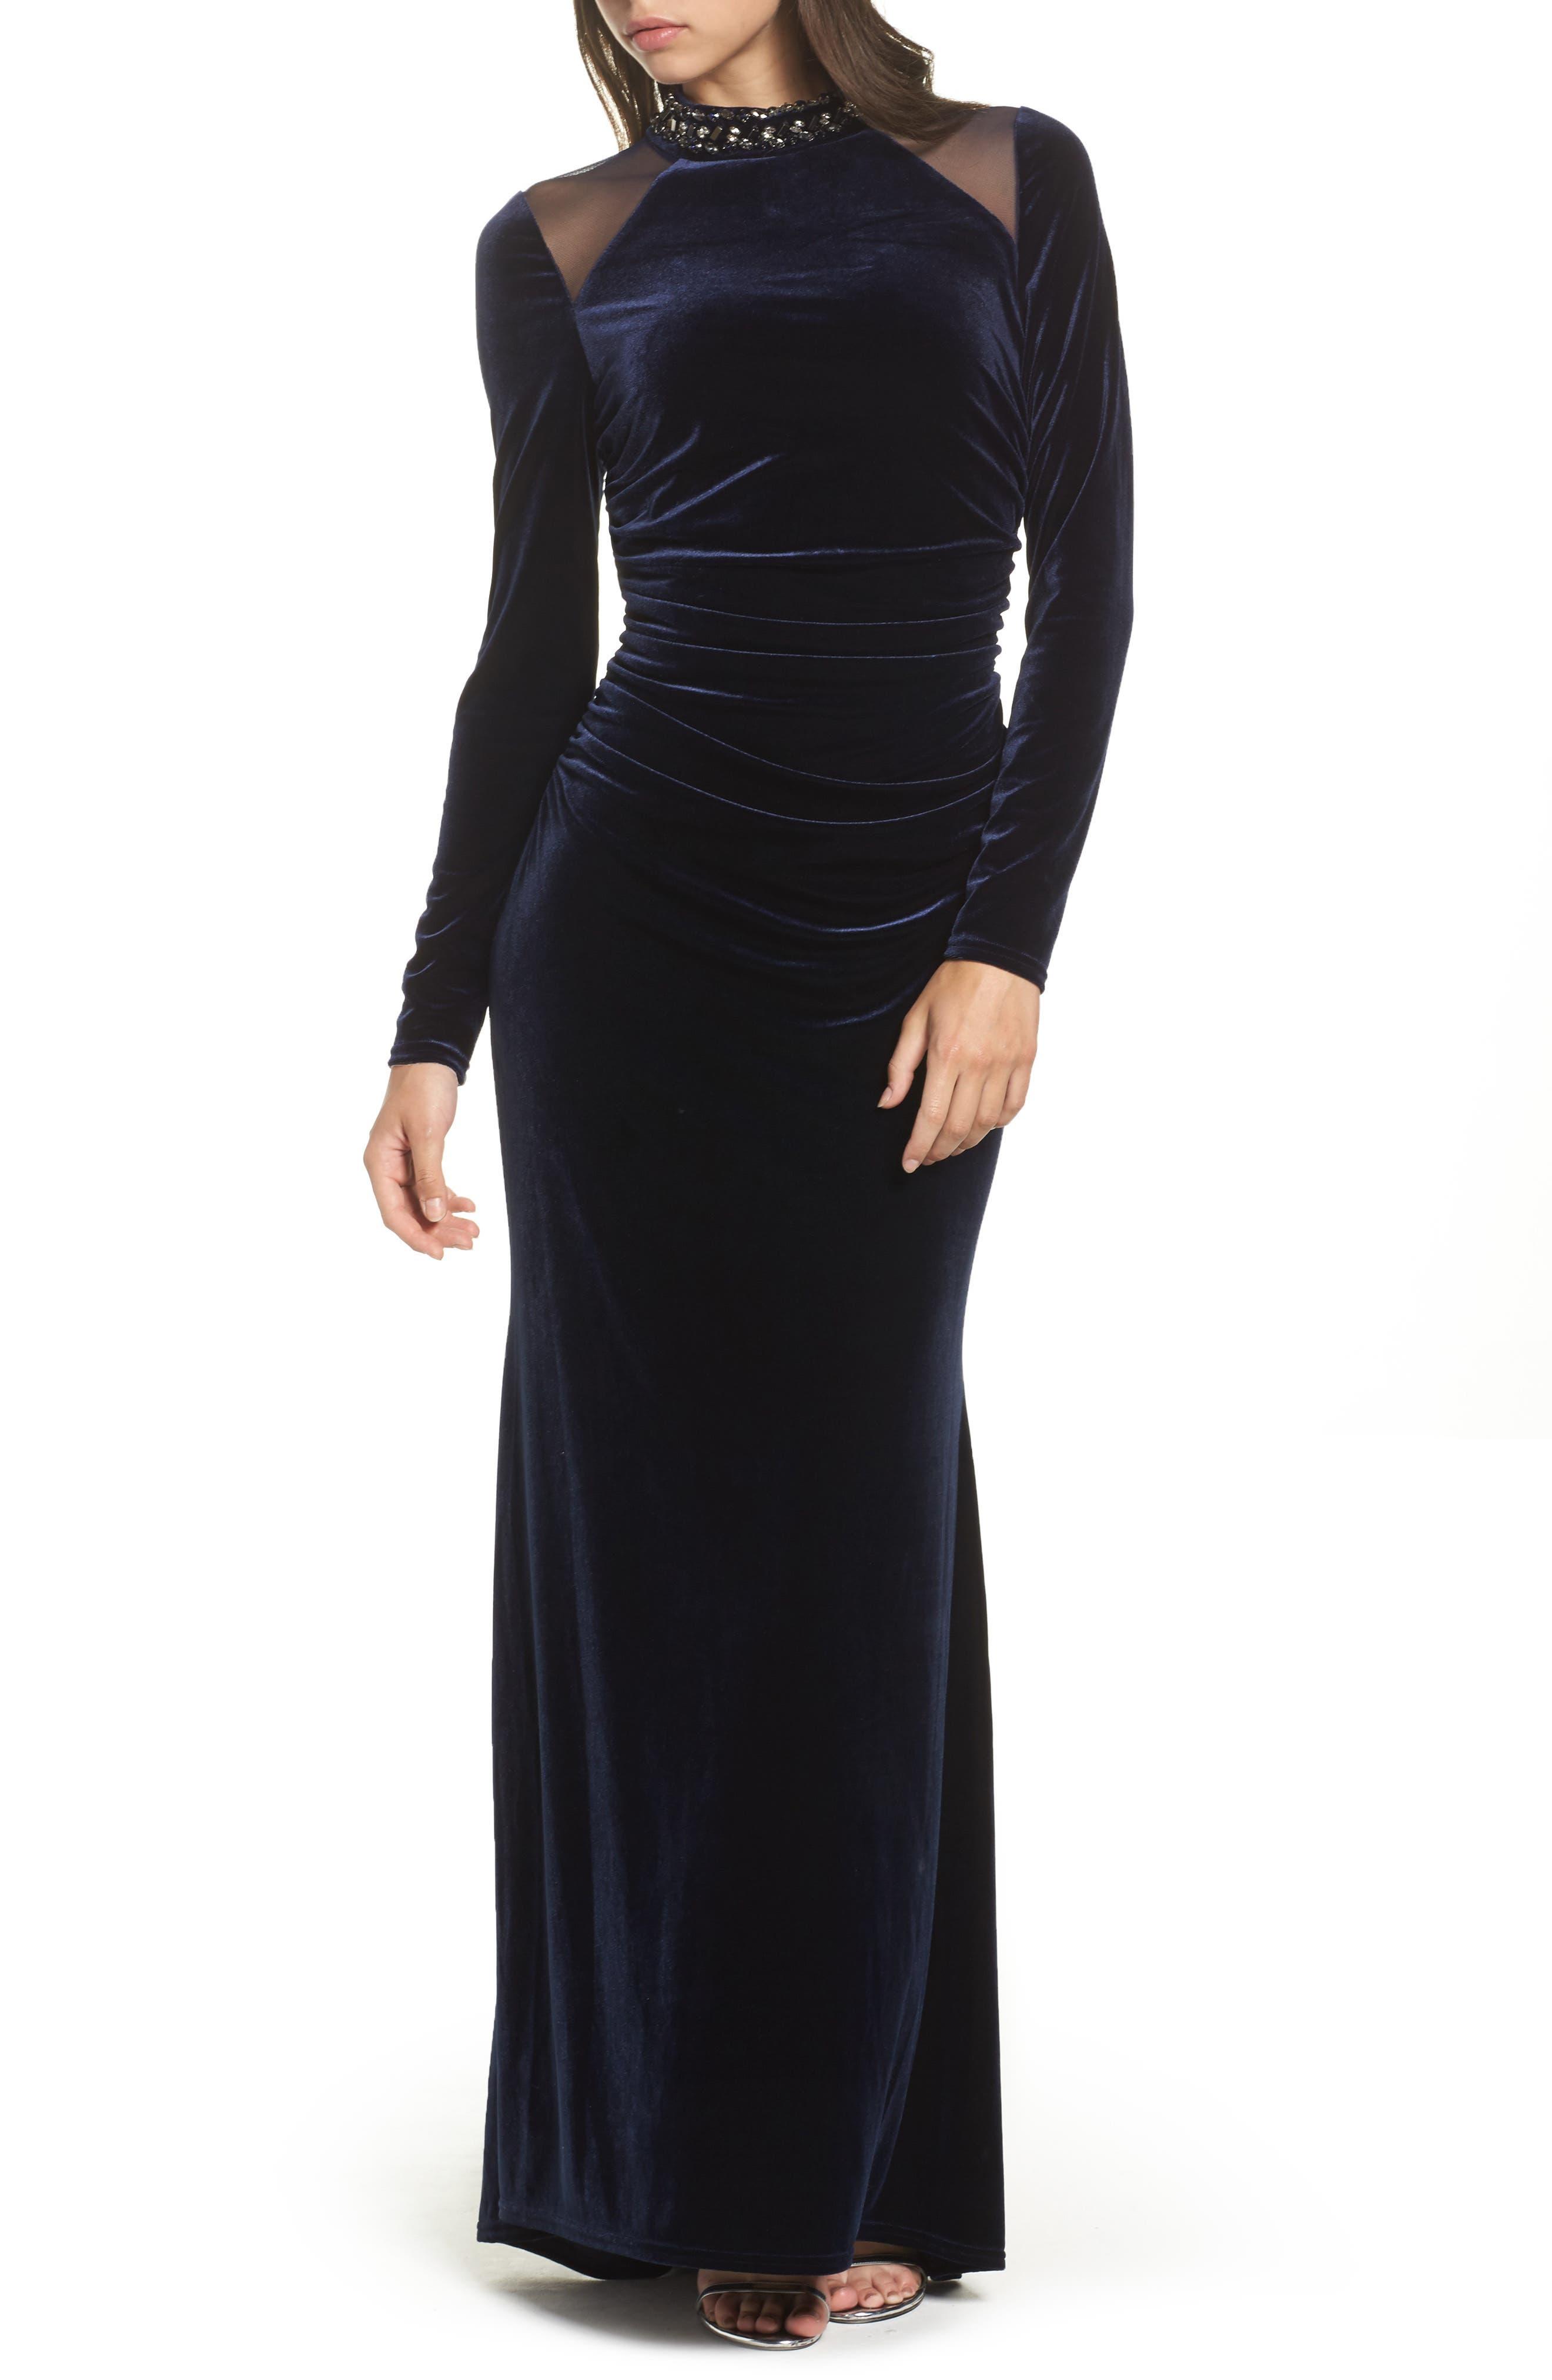 Alternate Image 1 Selected - Vince Camuto Mesh Panel Embellished Velvet Gown